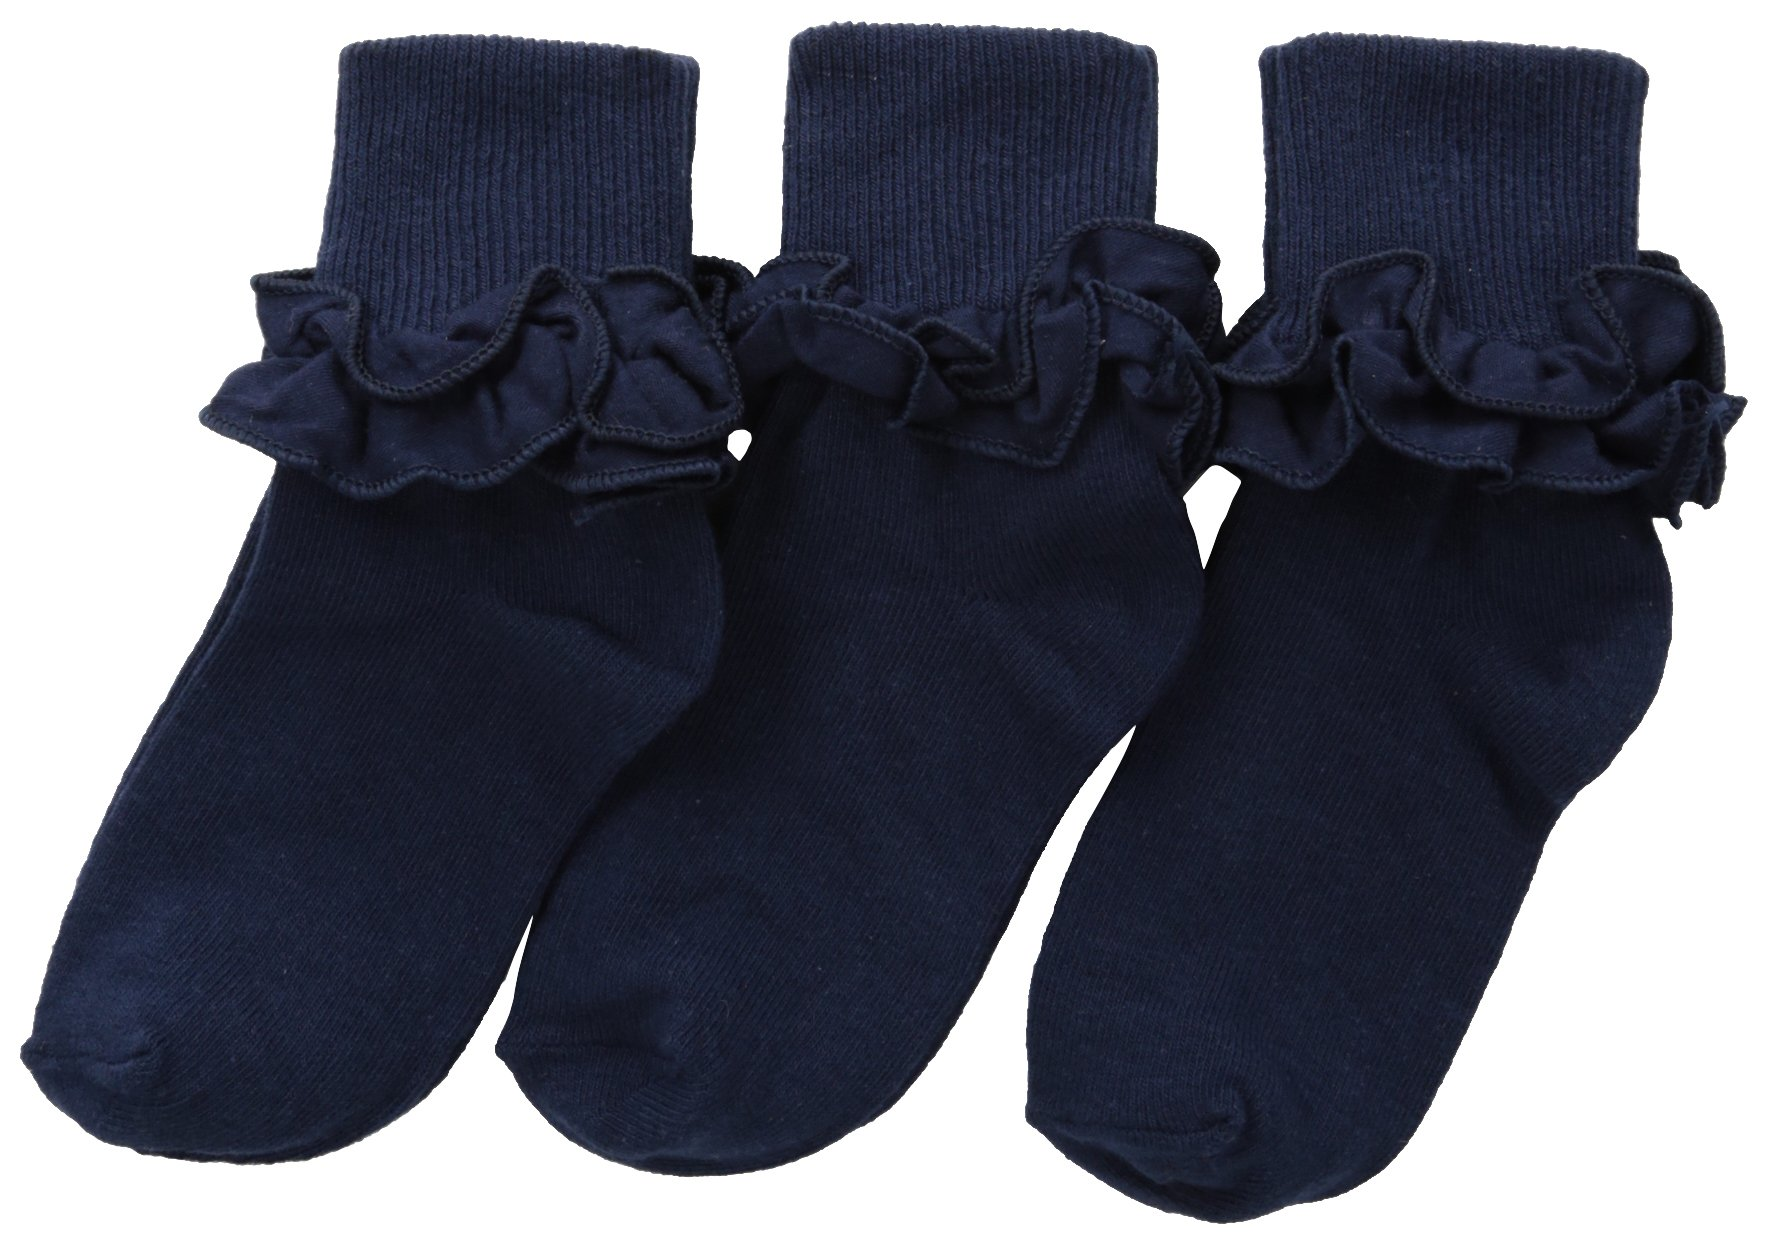 Jefferies Socks Little Girls' Misty Ruffle Turn Cuff (Pack of 3), Navy, Small